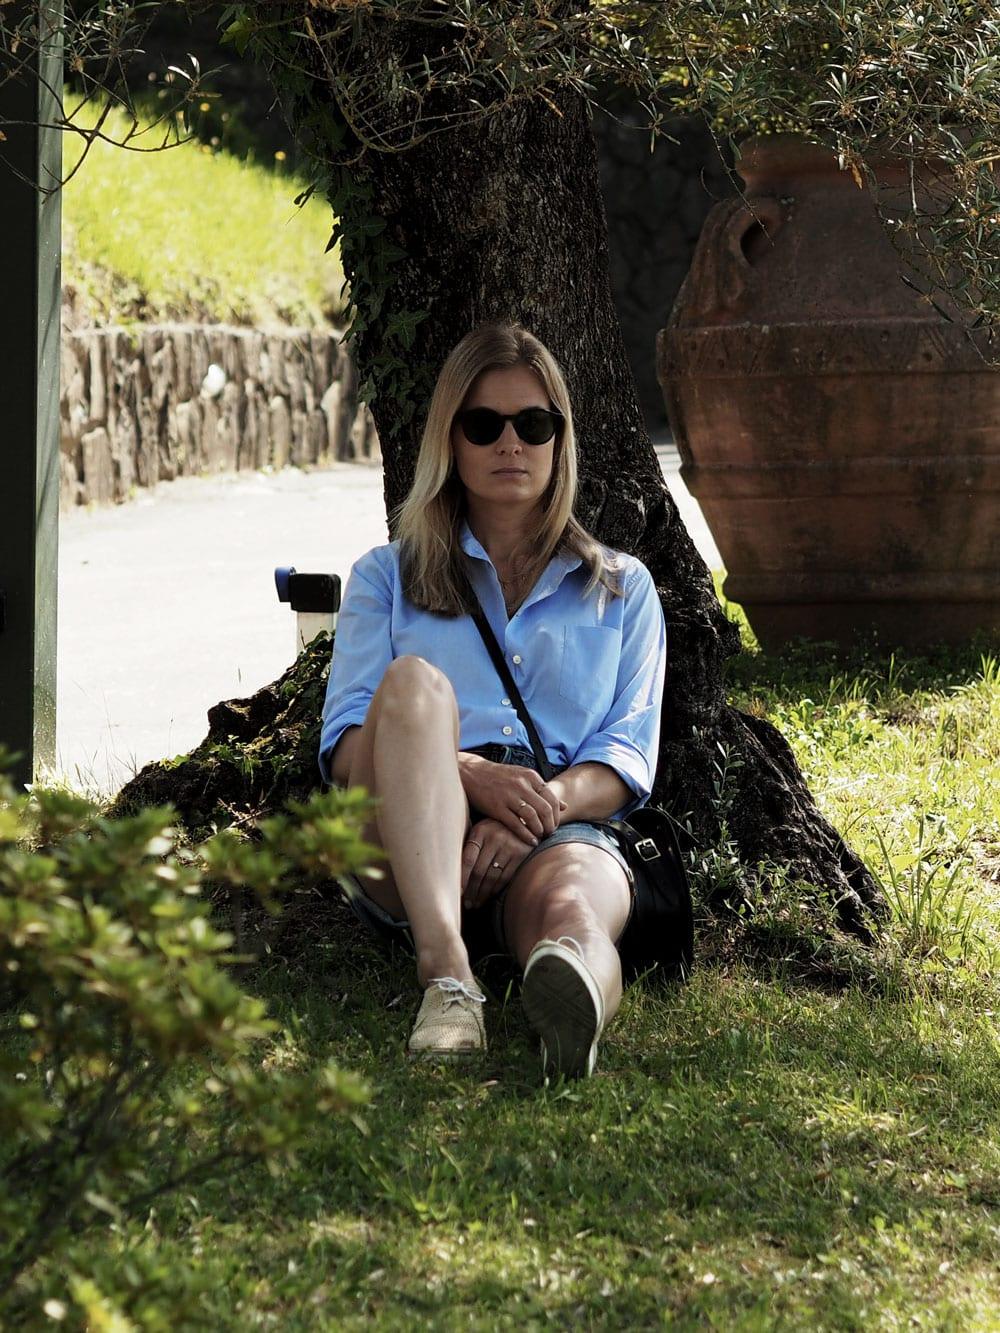 Style&Minimalism | It's Personal | Lucca | Wearing ME+EM blue shirt, AYR denim shorts, Cambridge Satchel Company saddle bag, Robert Clergerie raffia flatforms